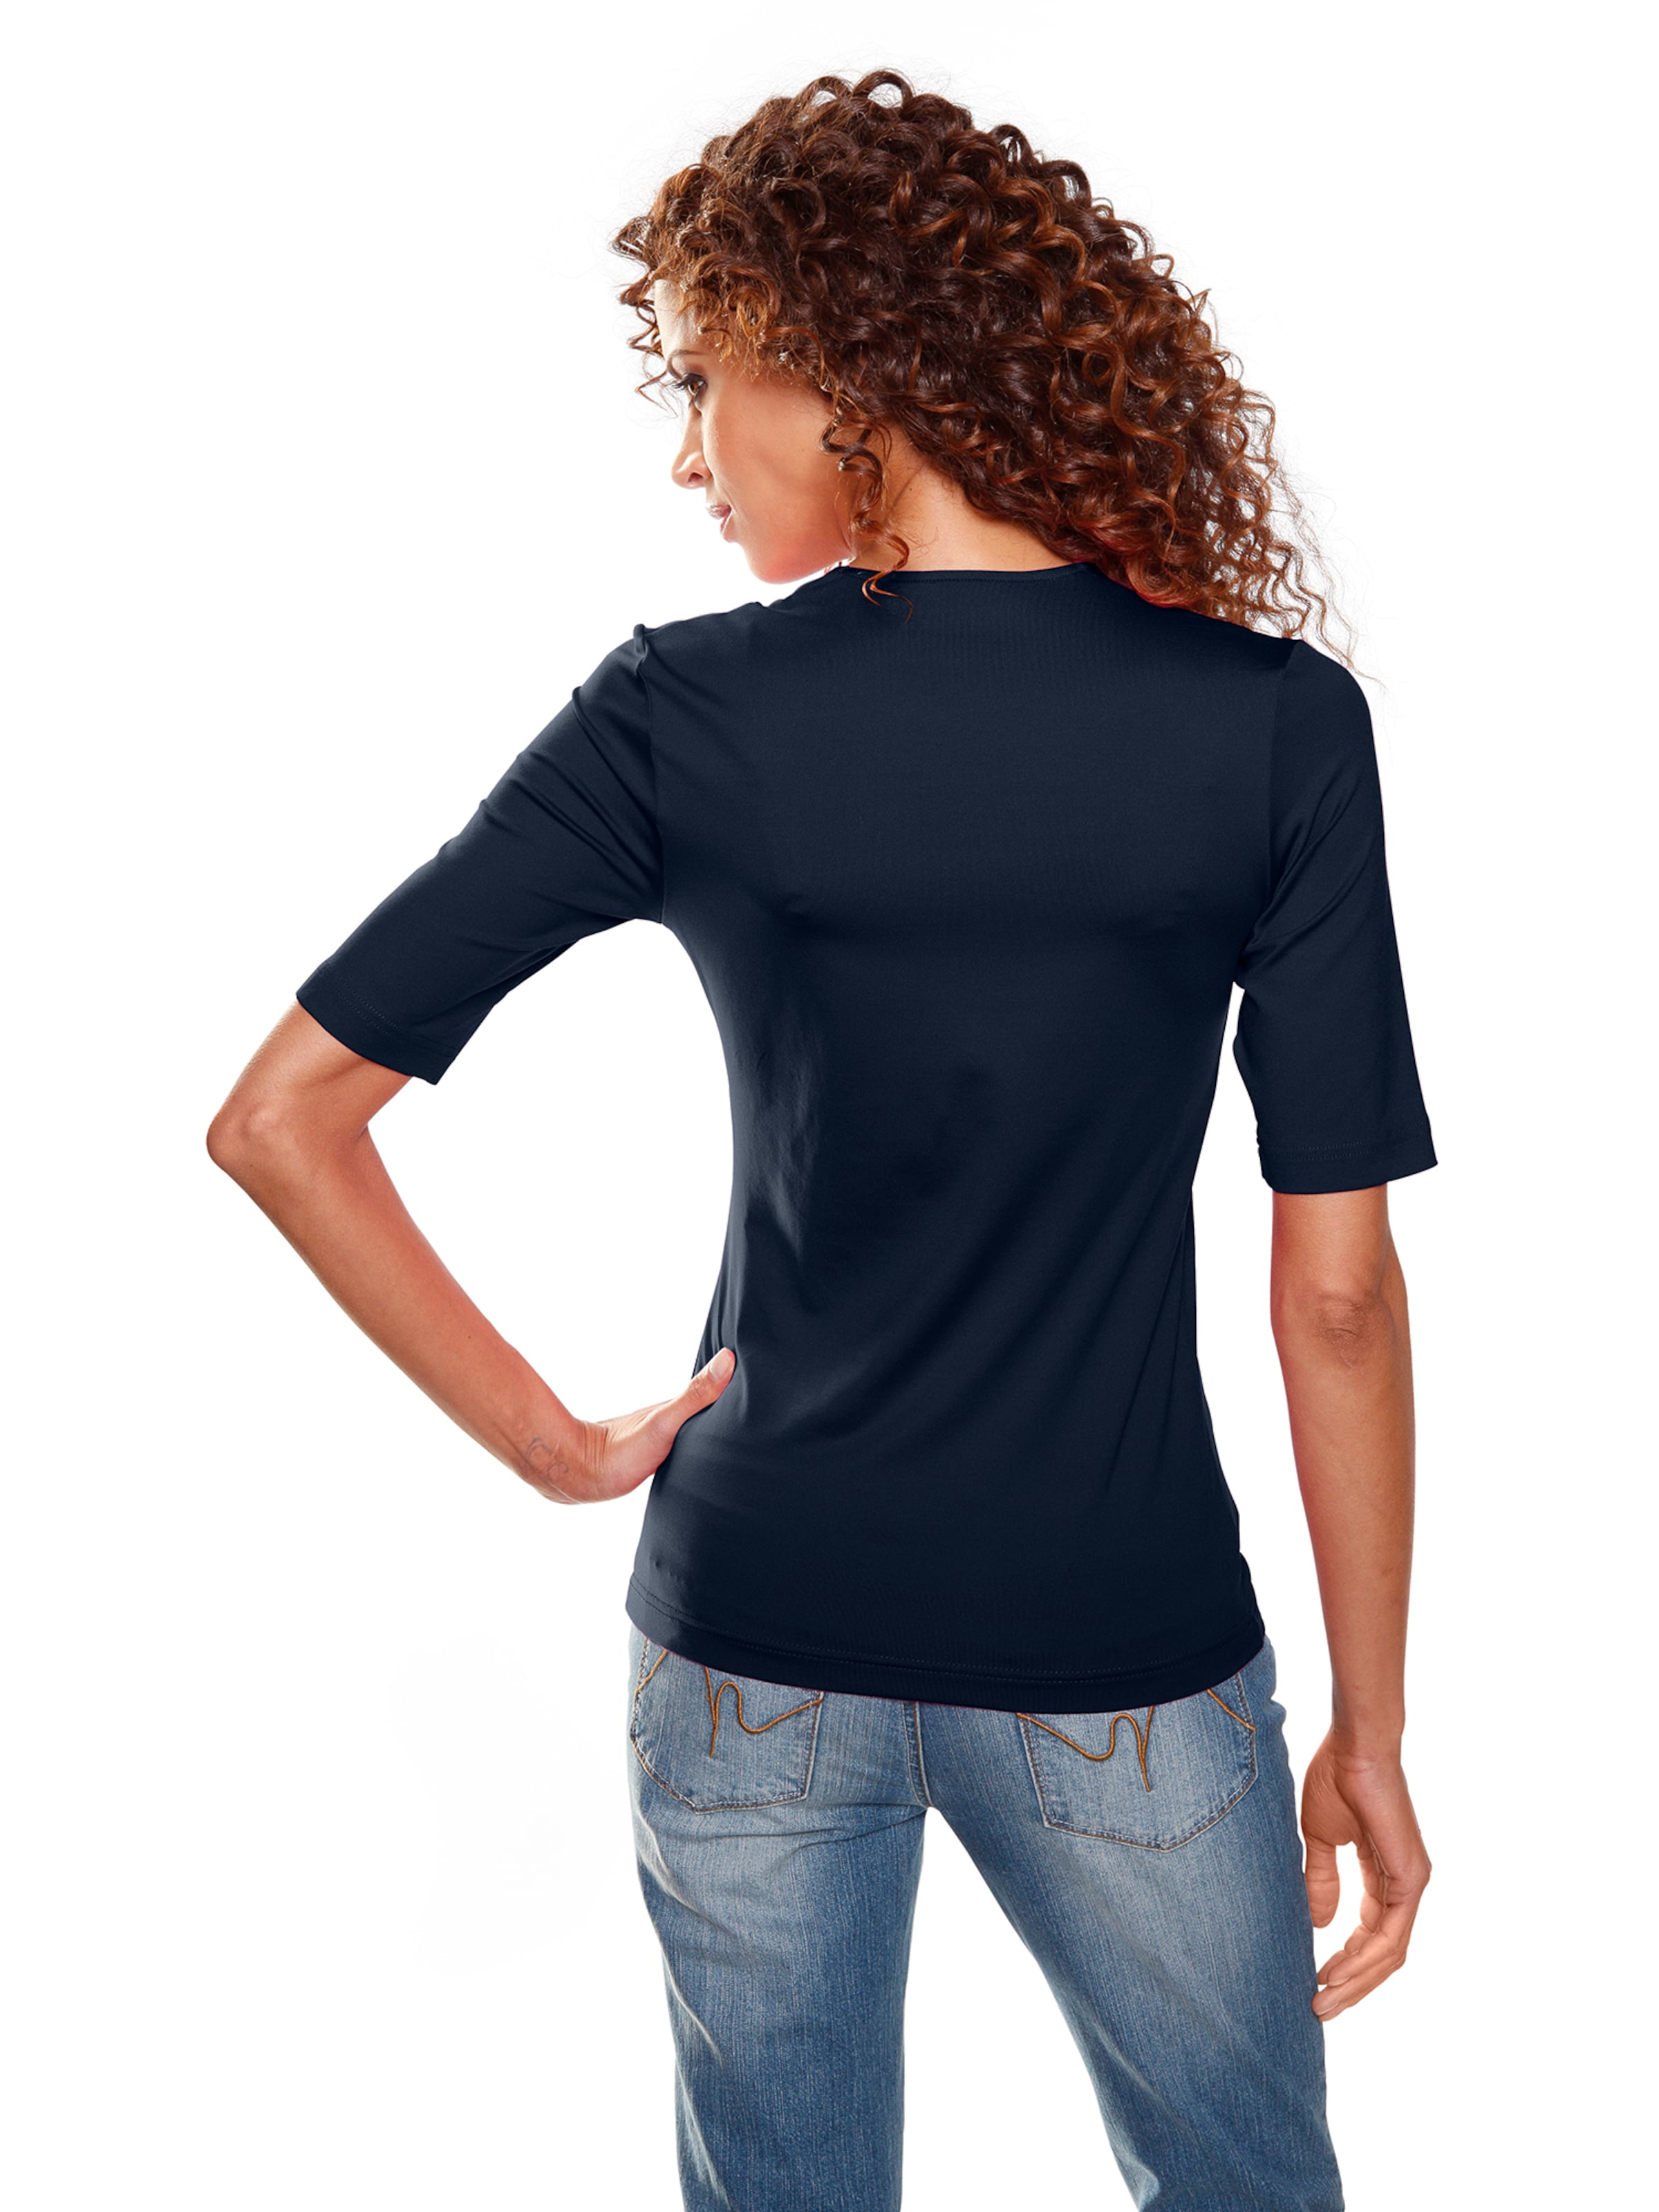 Marine T T shirt Heine shirt Heine En En En shirt Marine Heine T jzqVLSUMpG